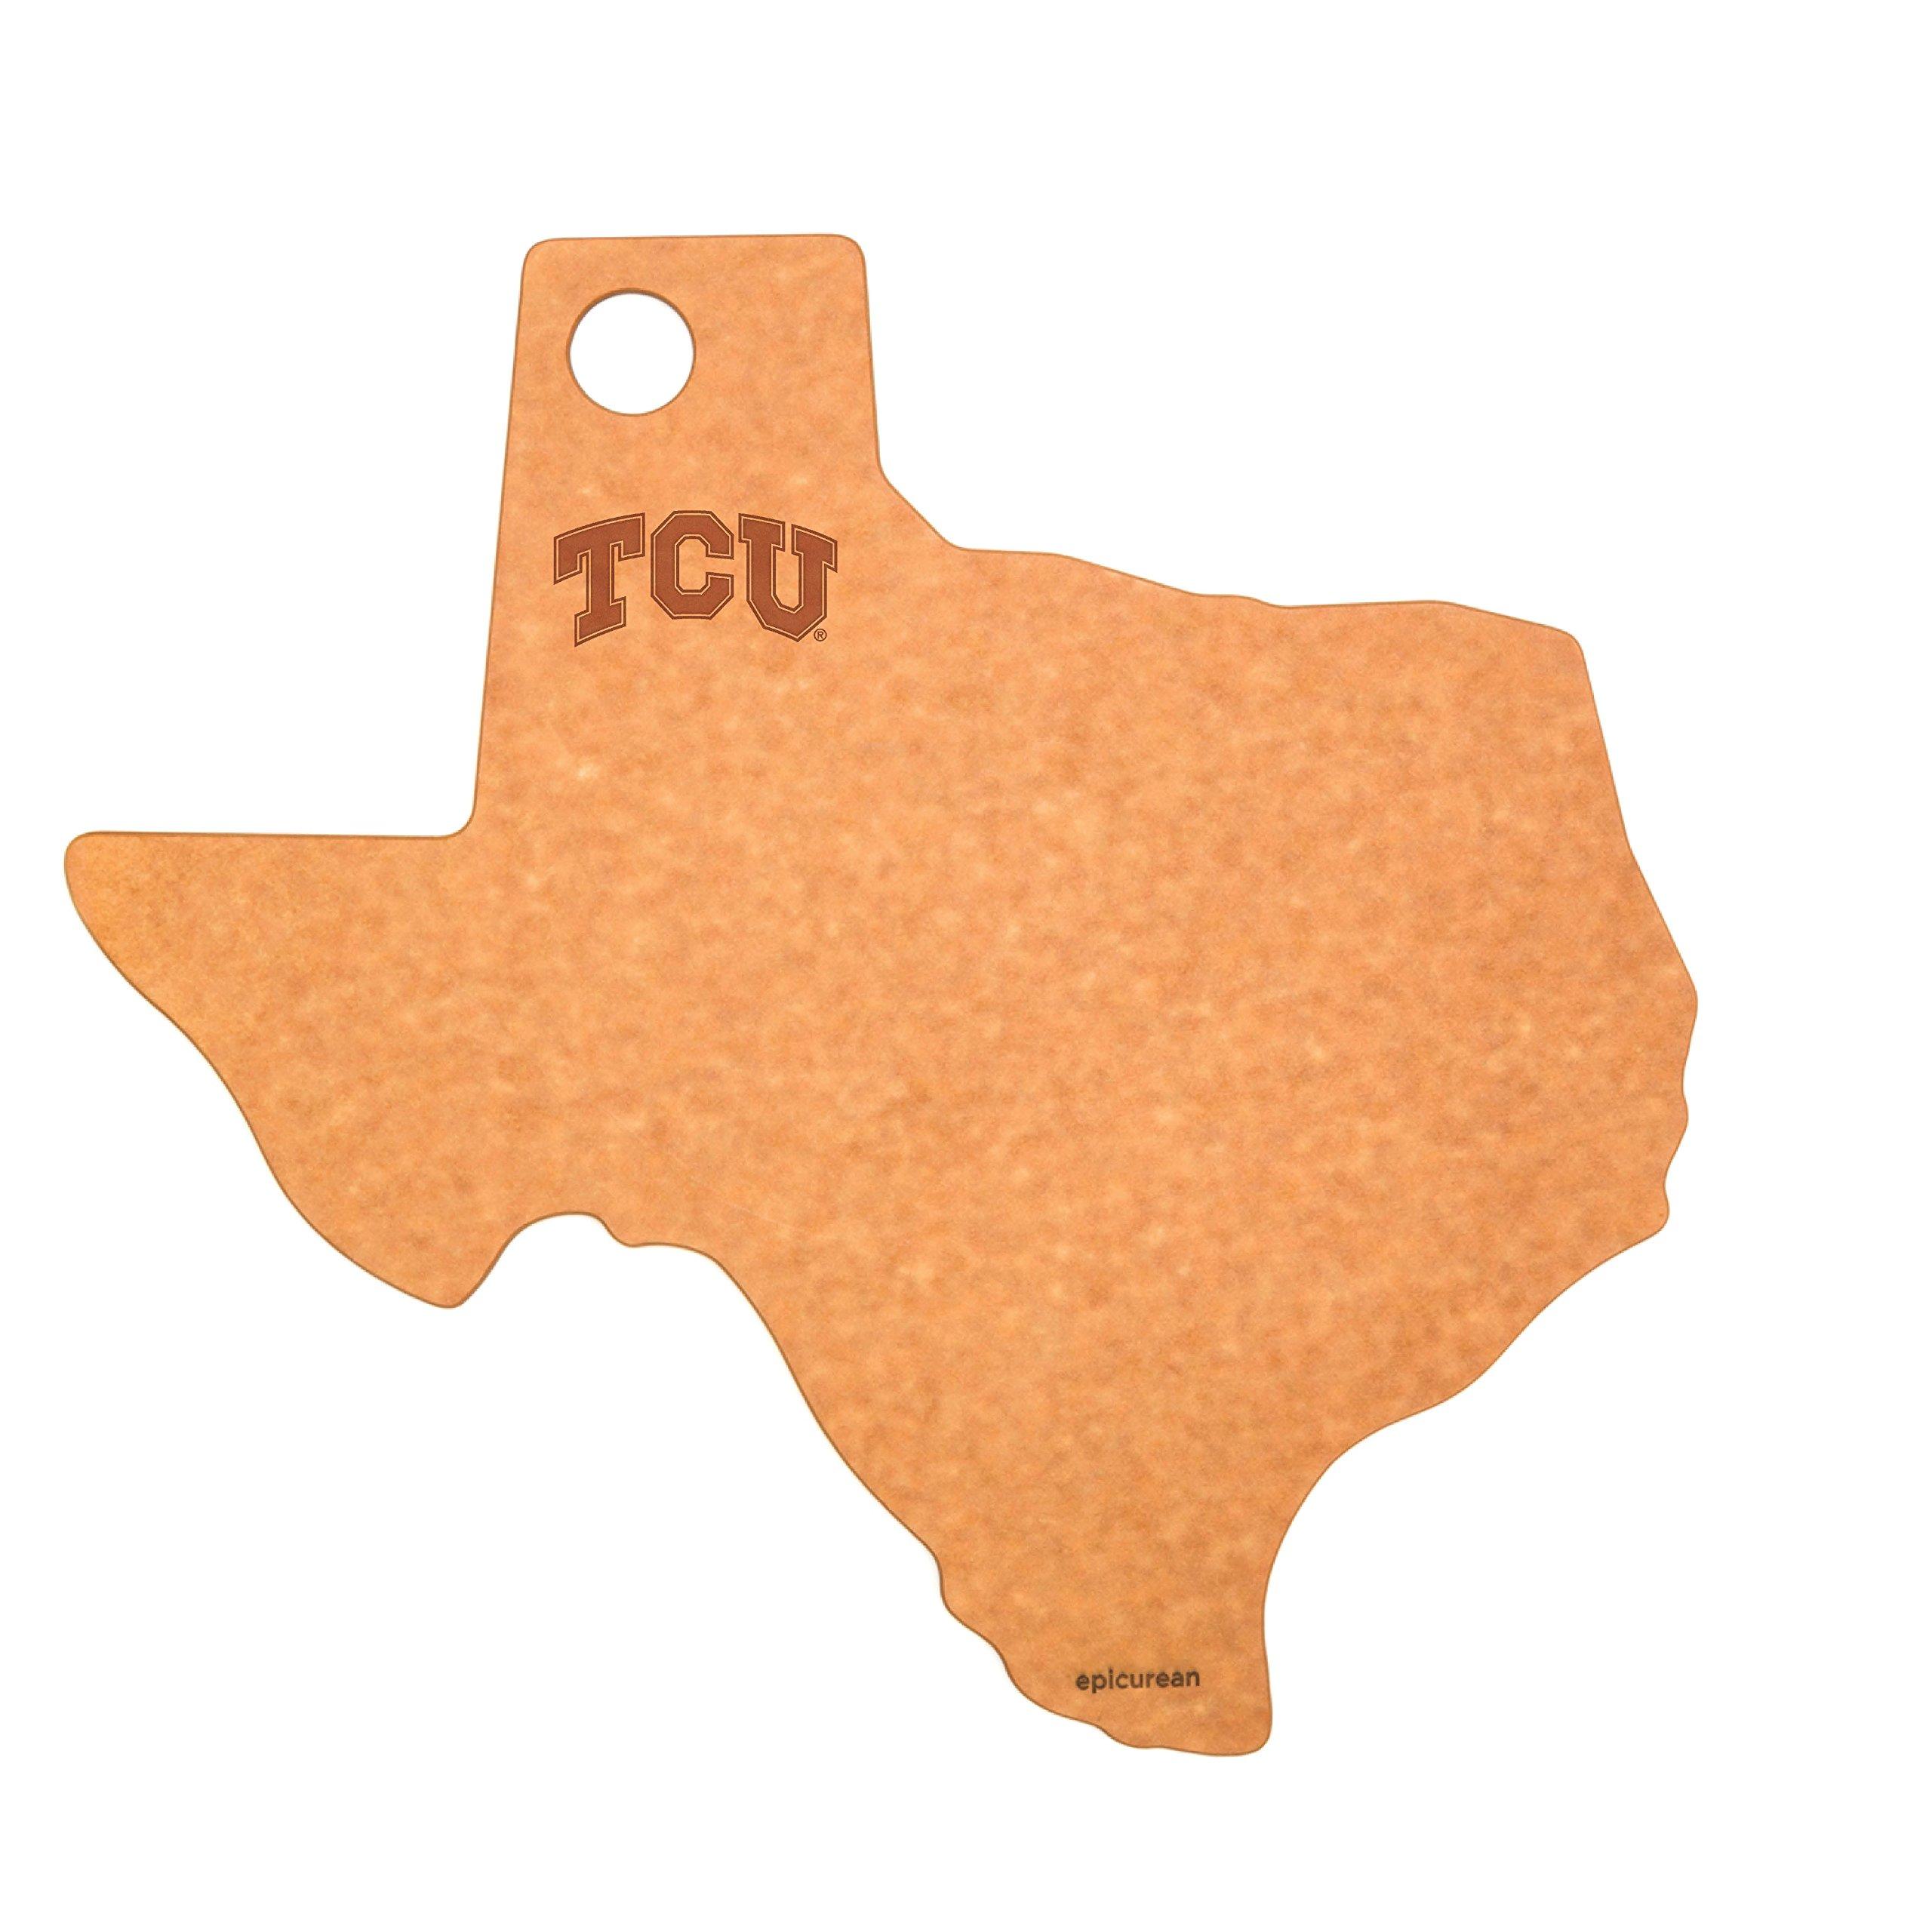 Epicurean C032-TX0102-TCU Texas Christian Tcu Horned Frogs Cheese Board, Natural/Slate